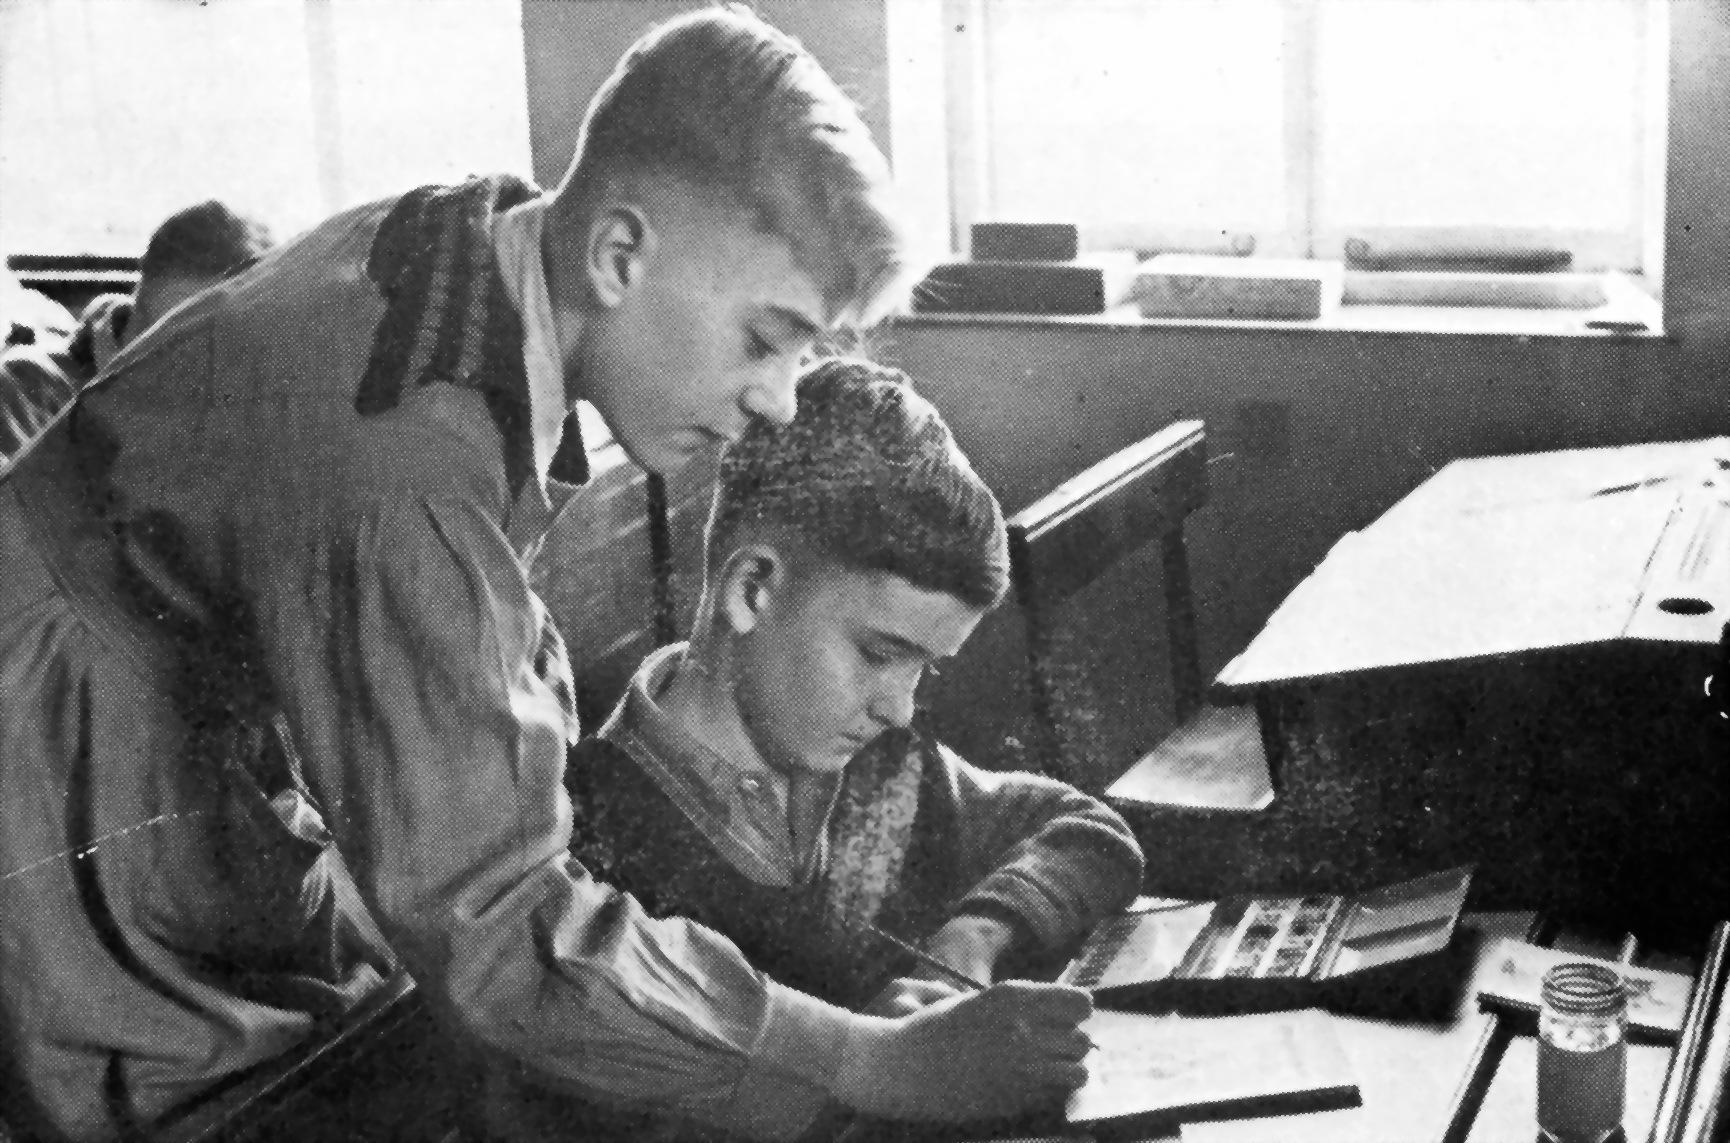 John Salt & Robin Bettie, 1948